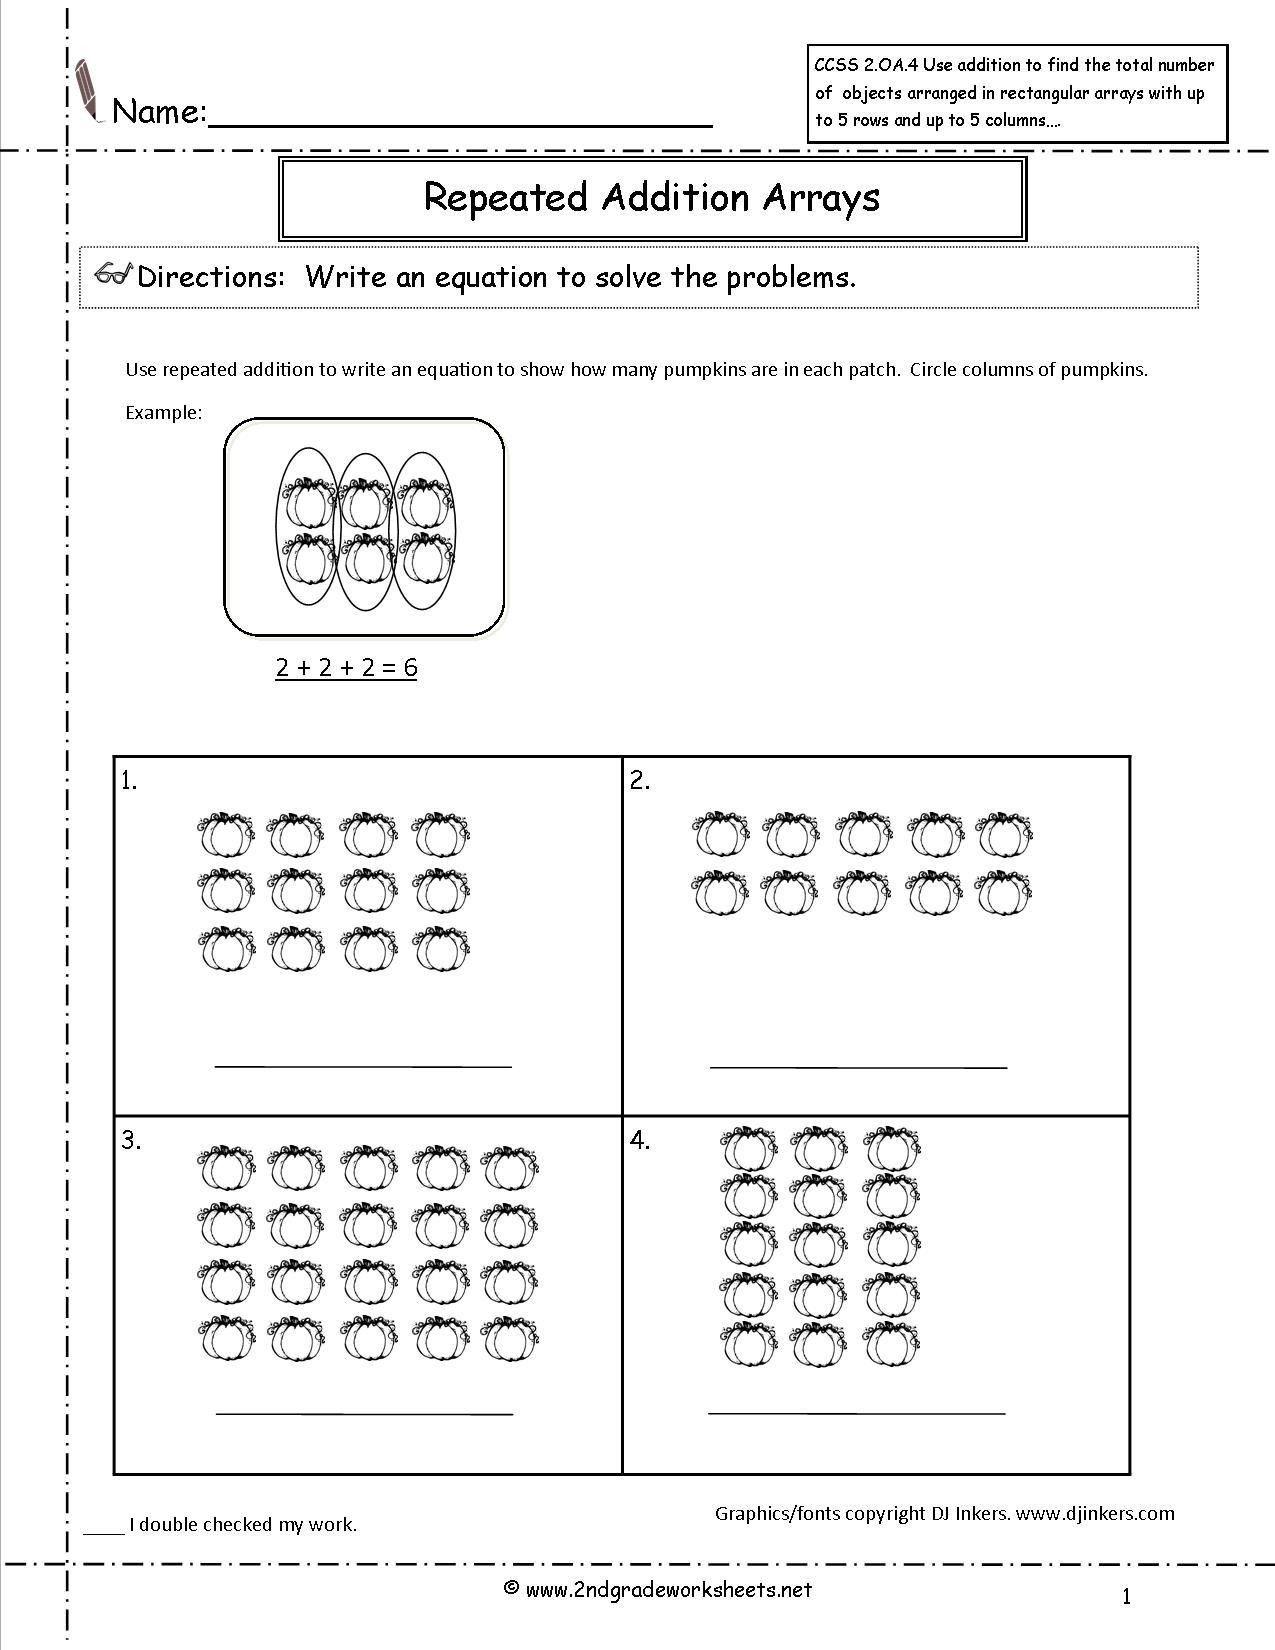 Division With Arrays Worksheet Pumpkins Repeated Addition Worksheet In 2020 Repeated Addition Worksheets Addition Worksheets Array Worksheets